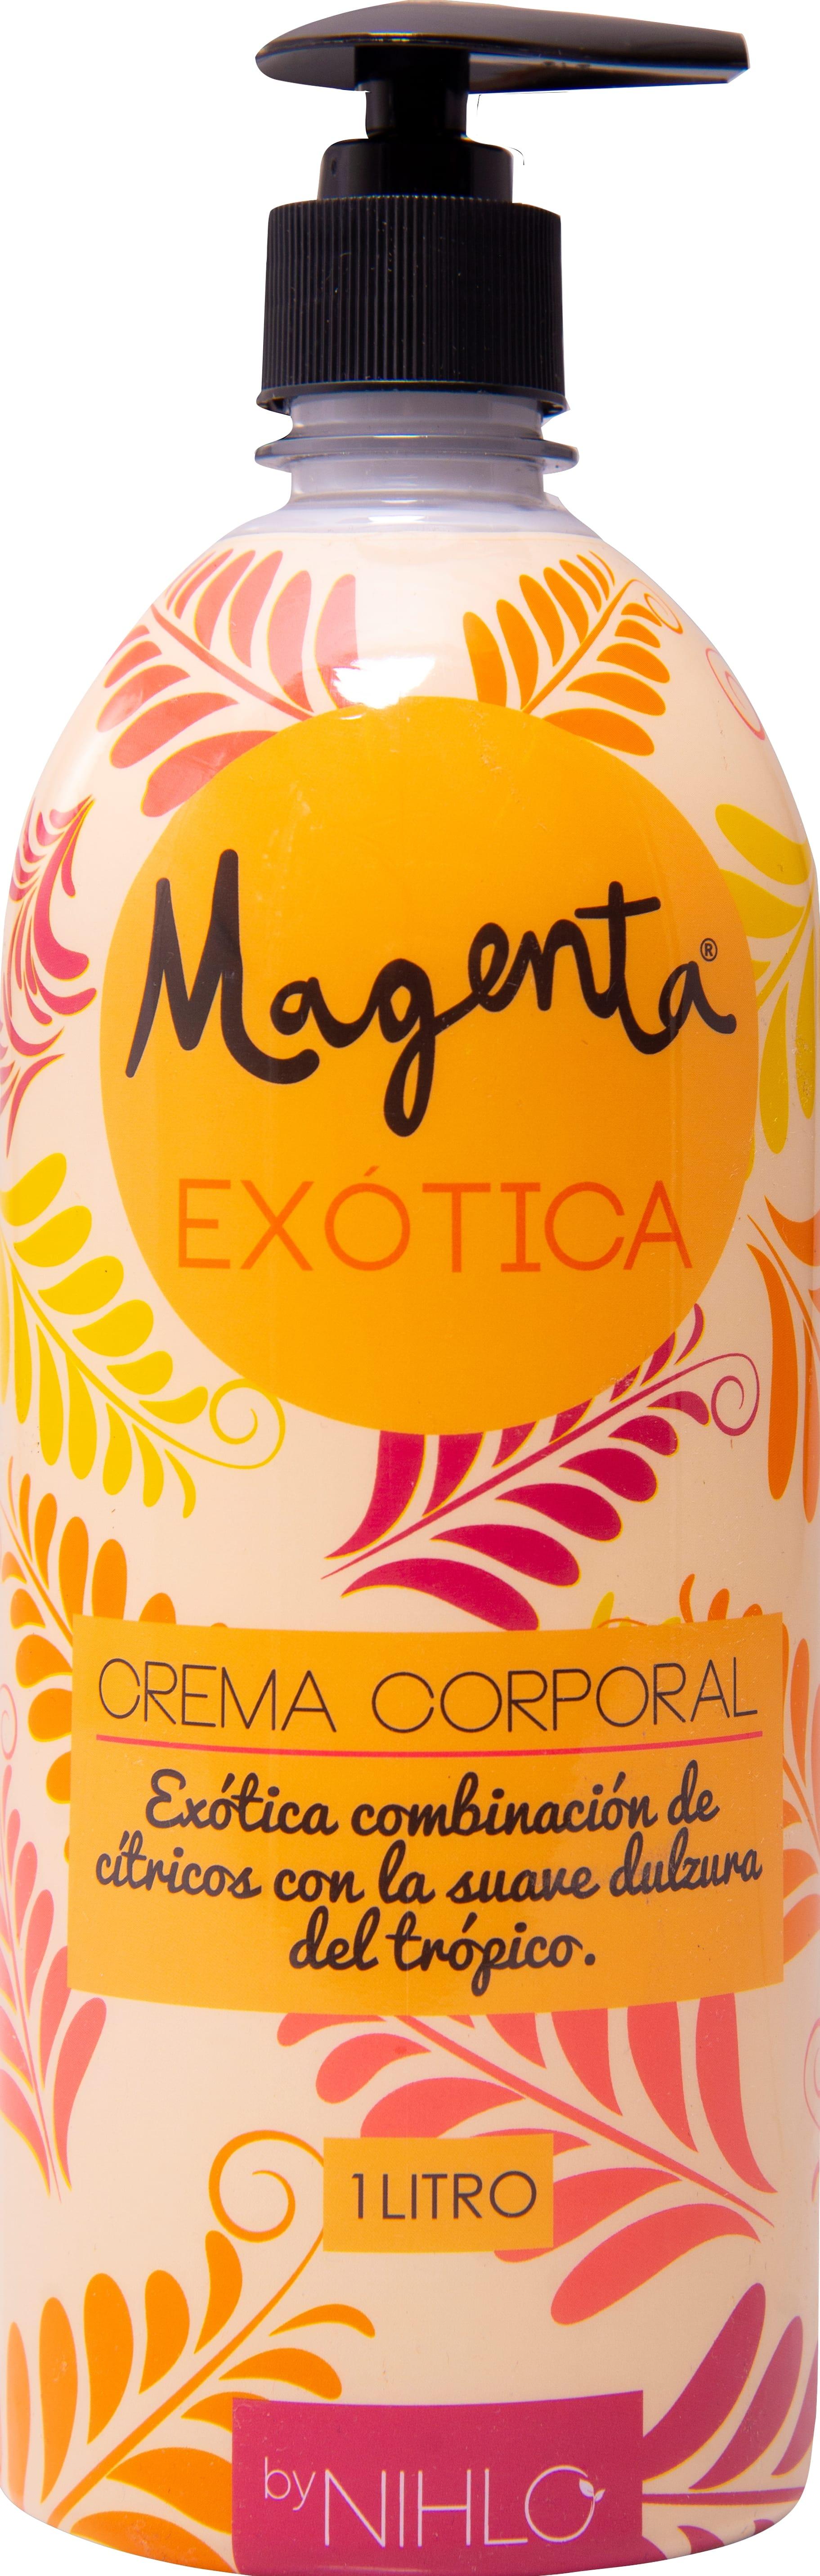 Crema 1 lt Exótica Magenta